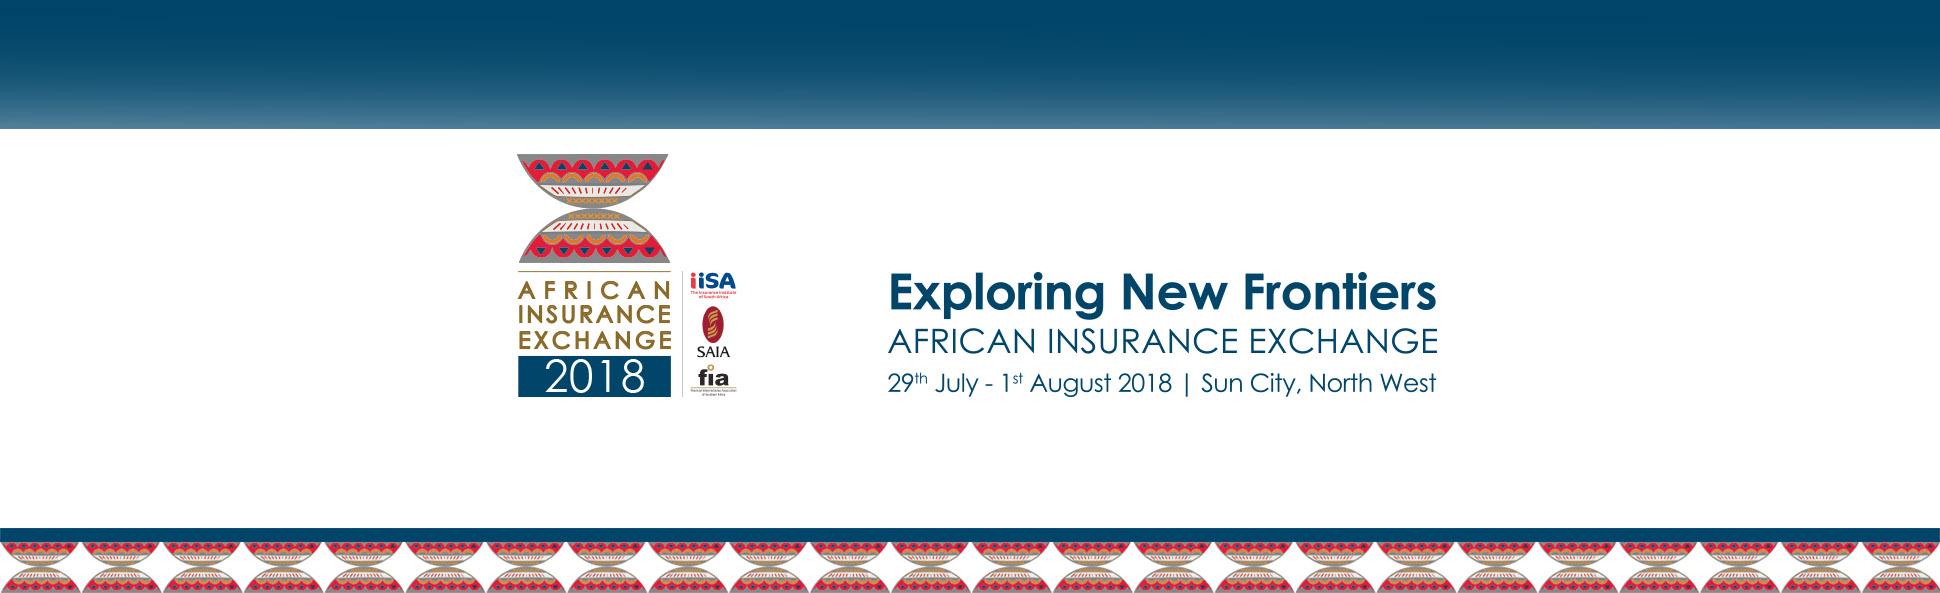 African Insurance Exchange 2018